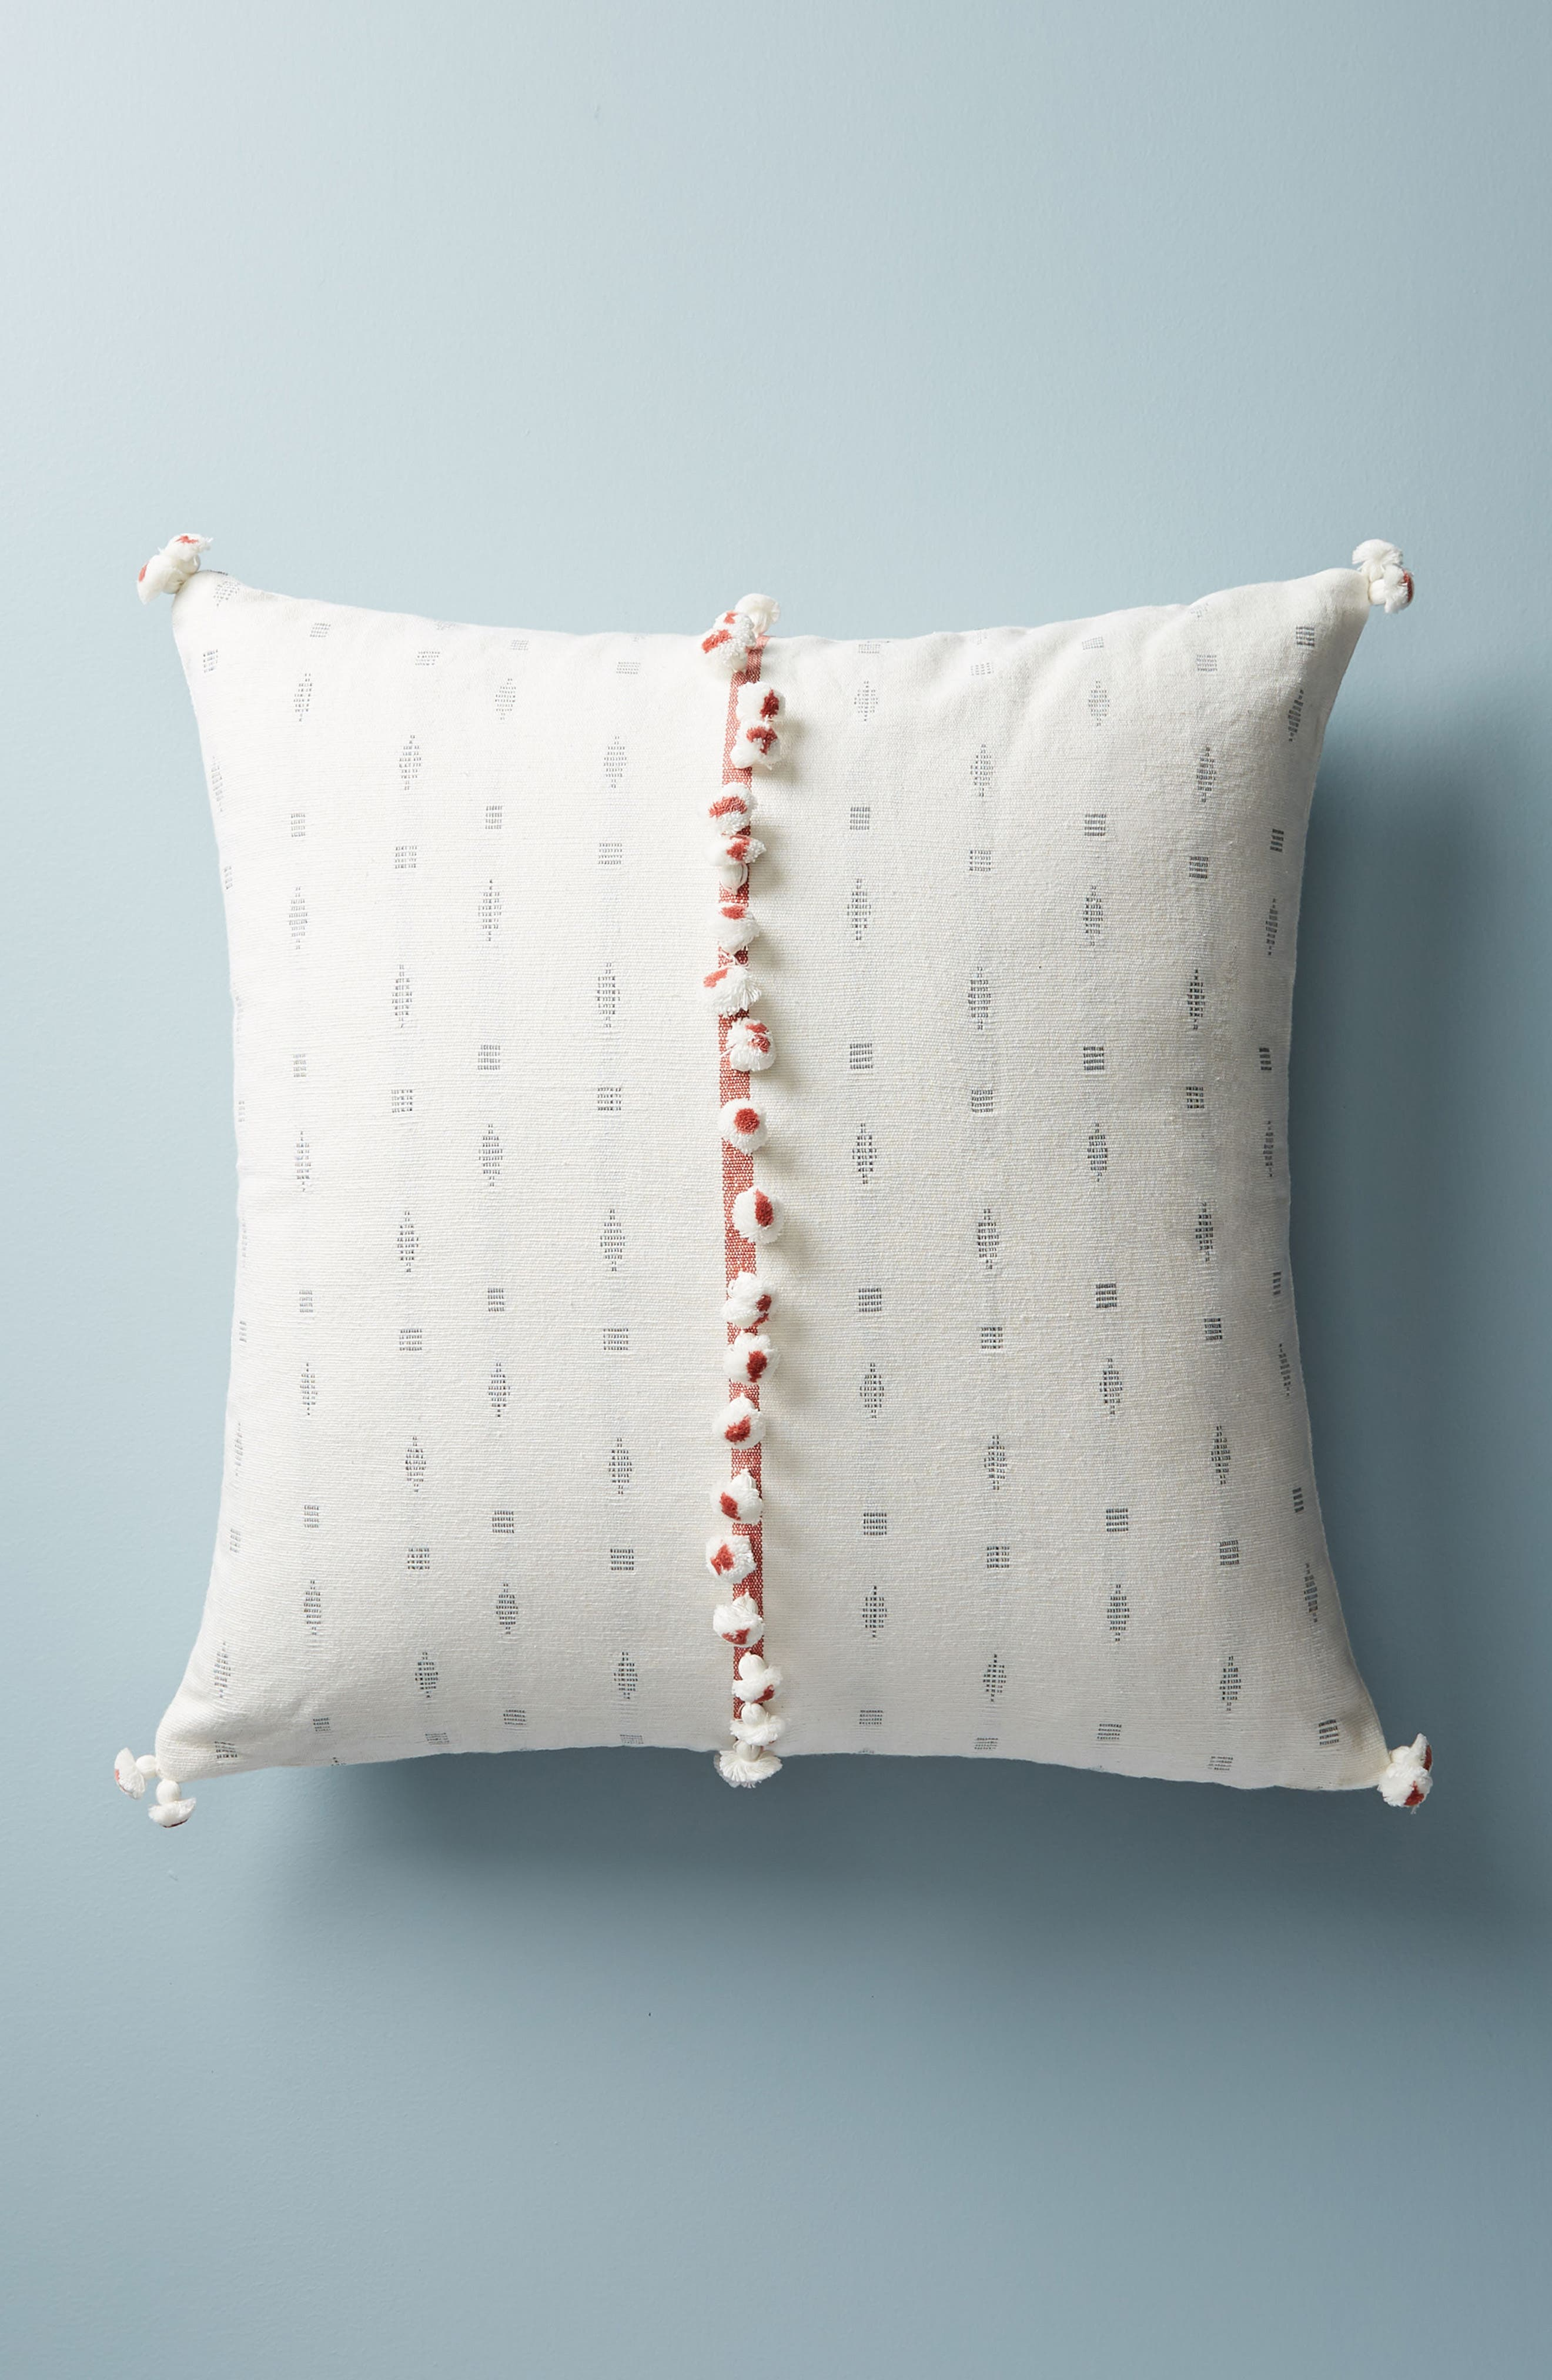 Alternate Image 1 Selected - Anthropologie Araya Accent Pillow